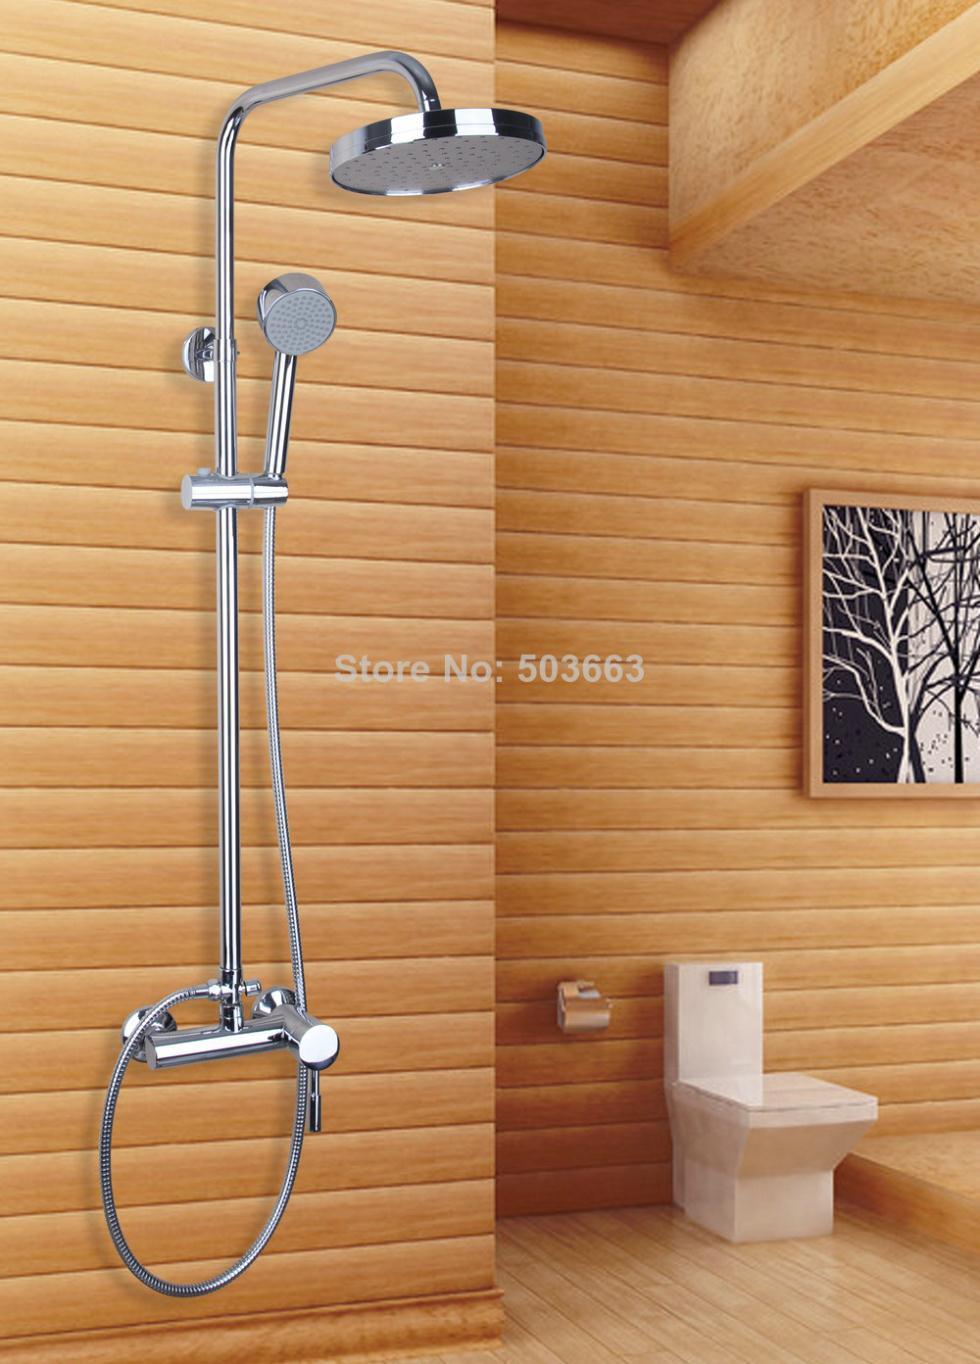 53201 Modern Bathroom Wall Mount Rain Shower Head Only Set Shower ...